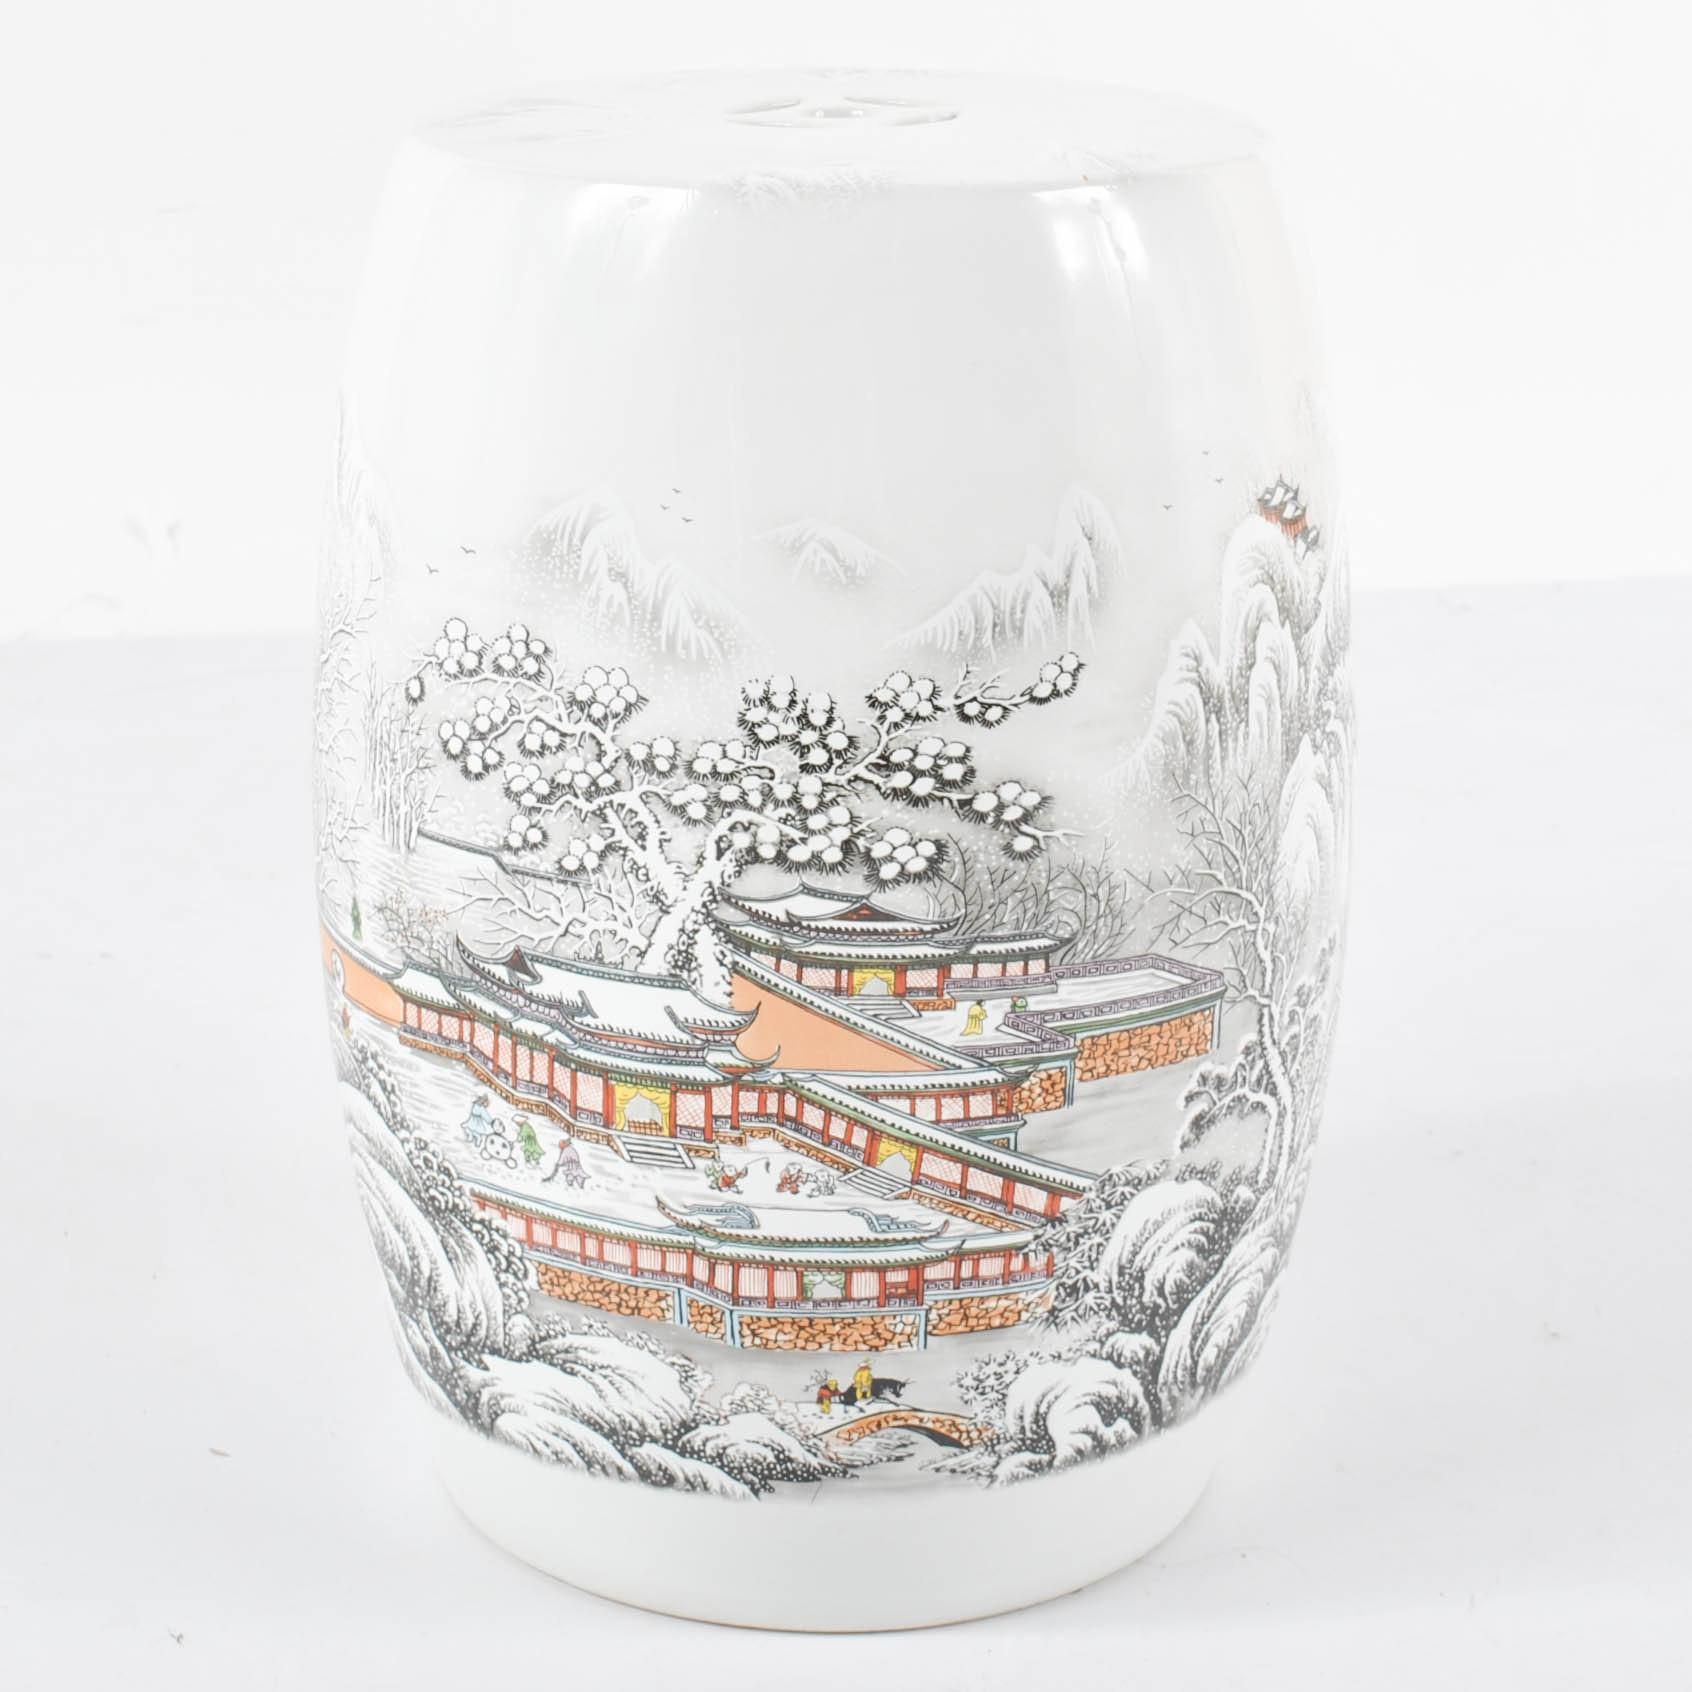 Chinese Ceramic Garden Stool Depicting Snowy Landscape